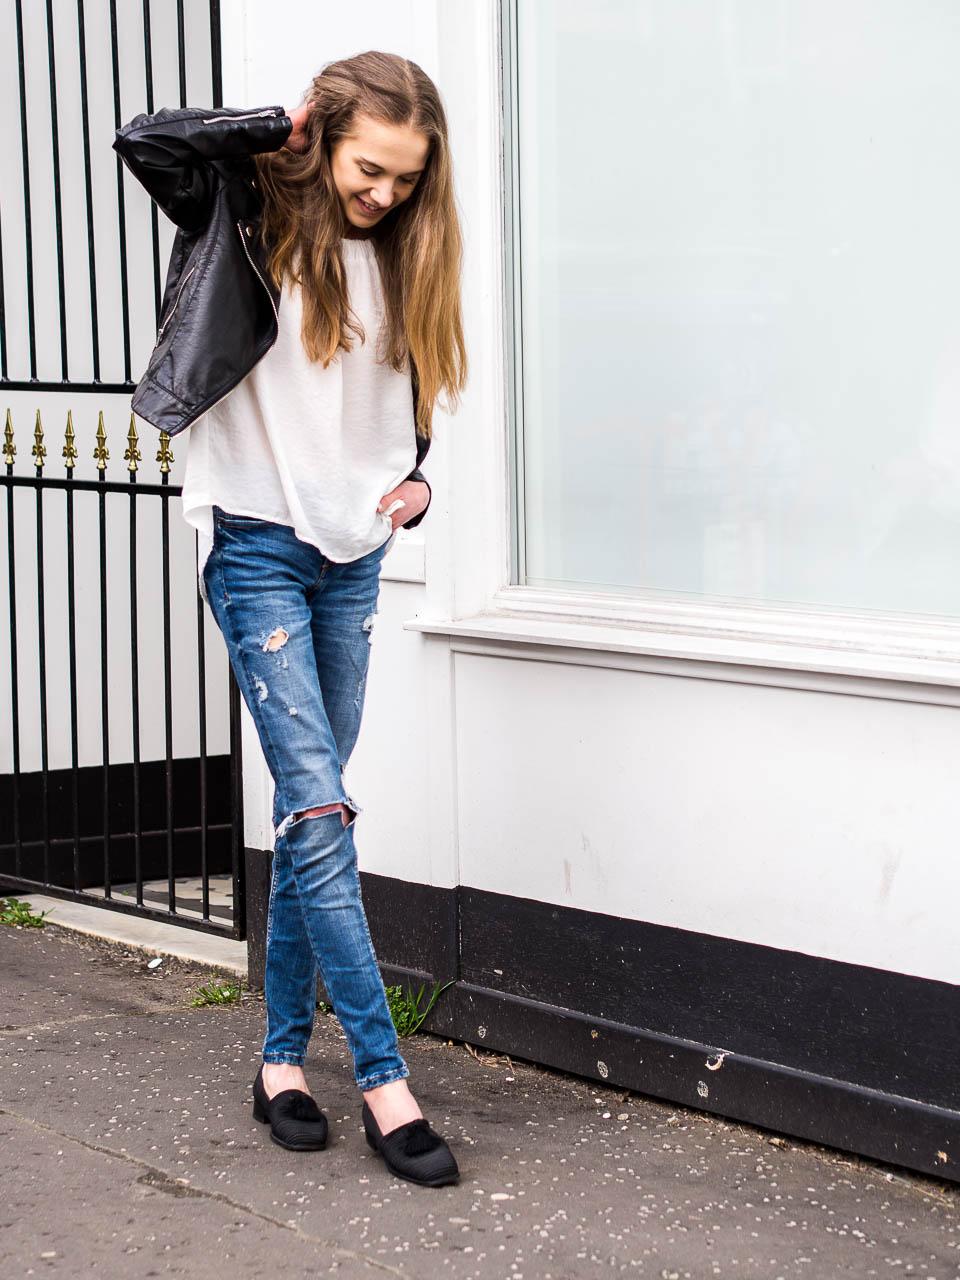 spring-fashion-inspiration-stuart-weitzman-shoes